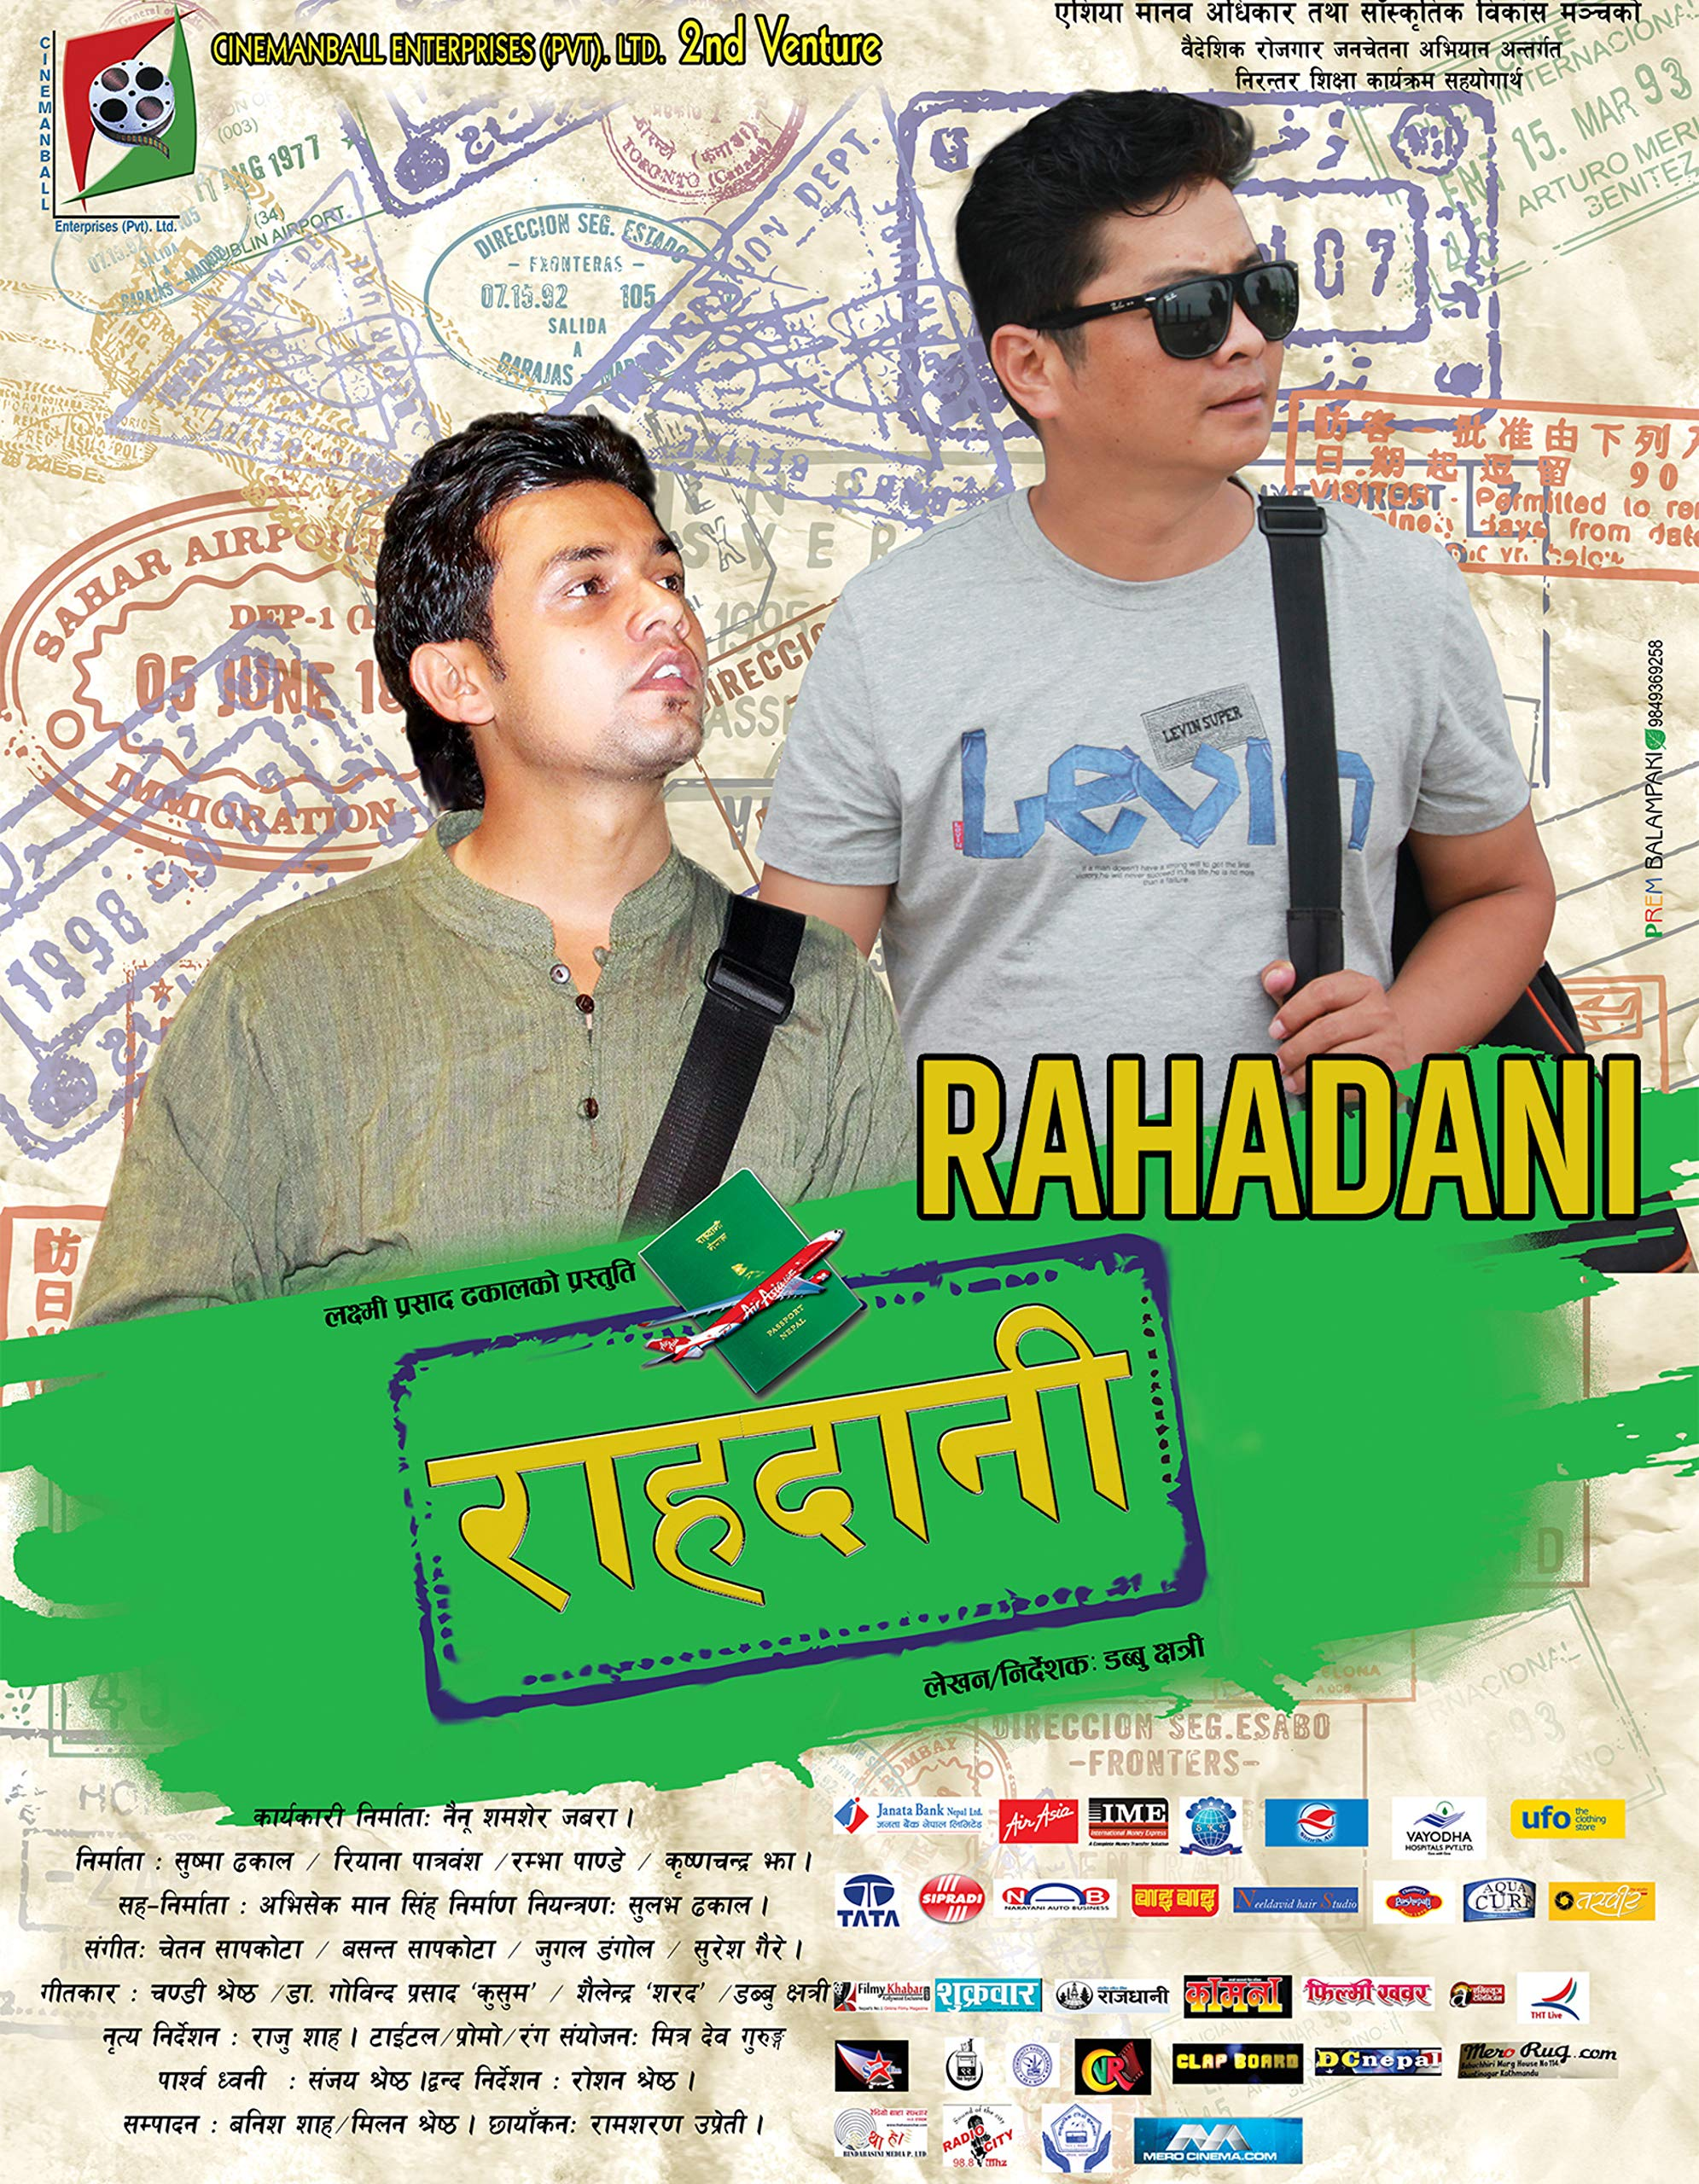 Rahadani